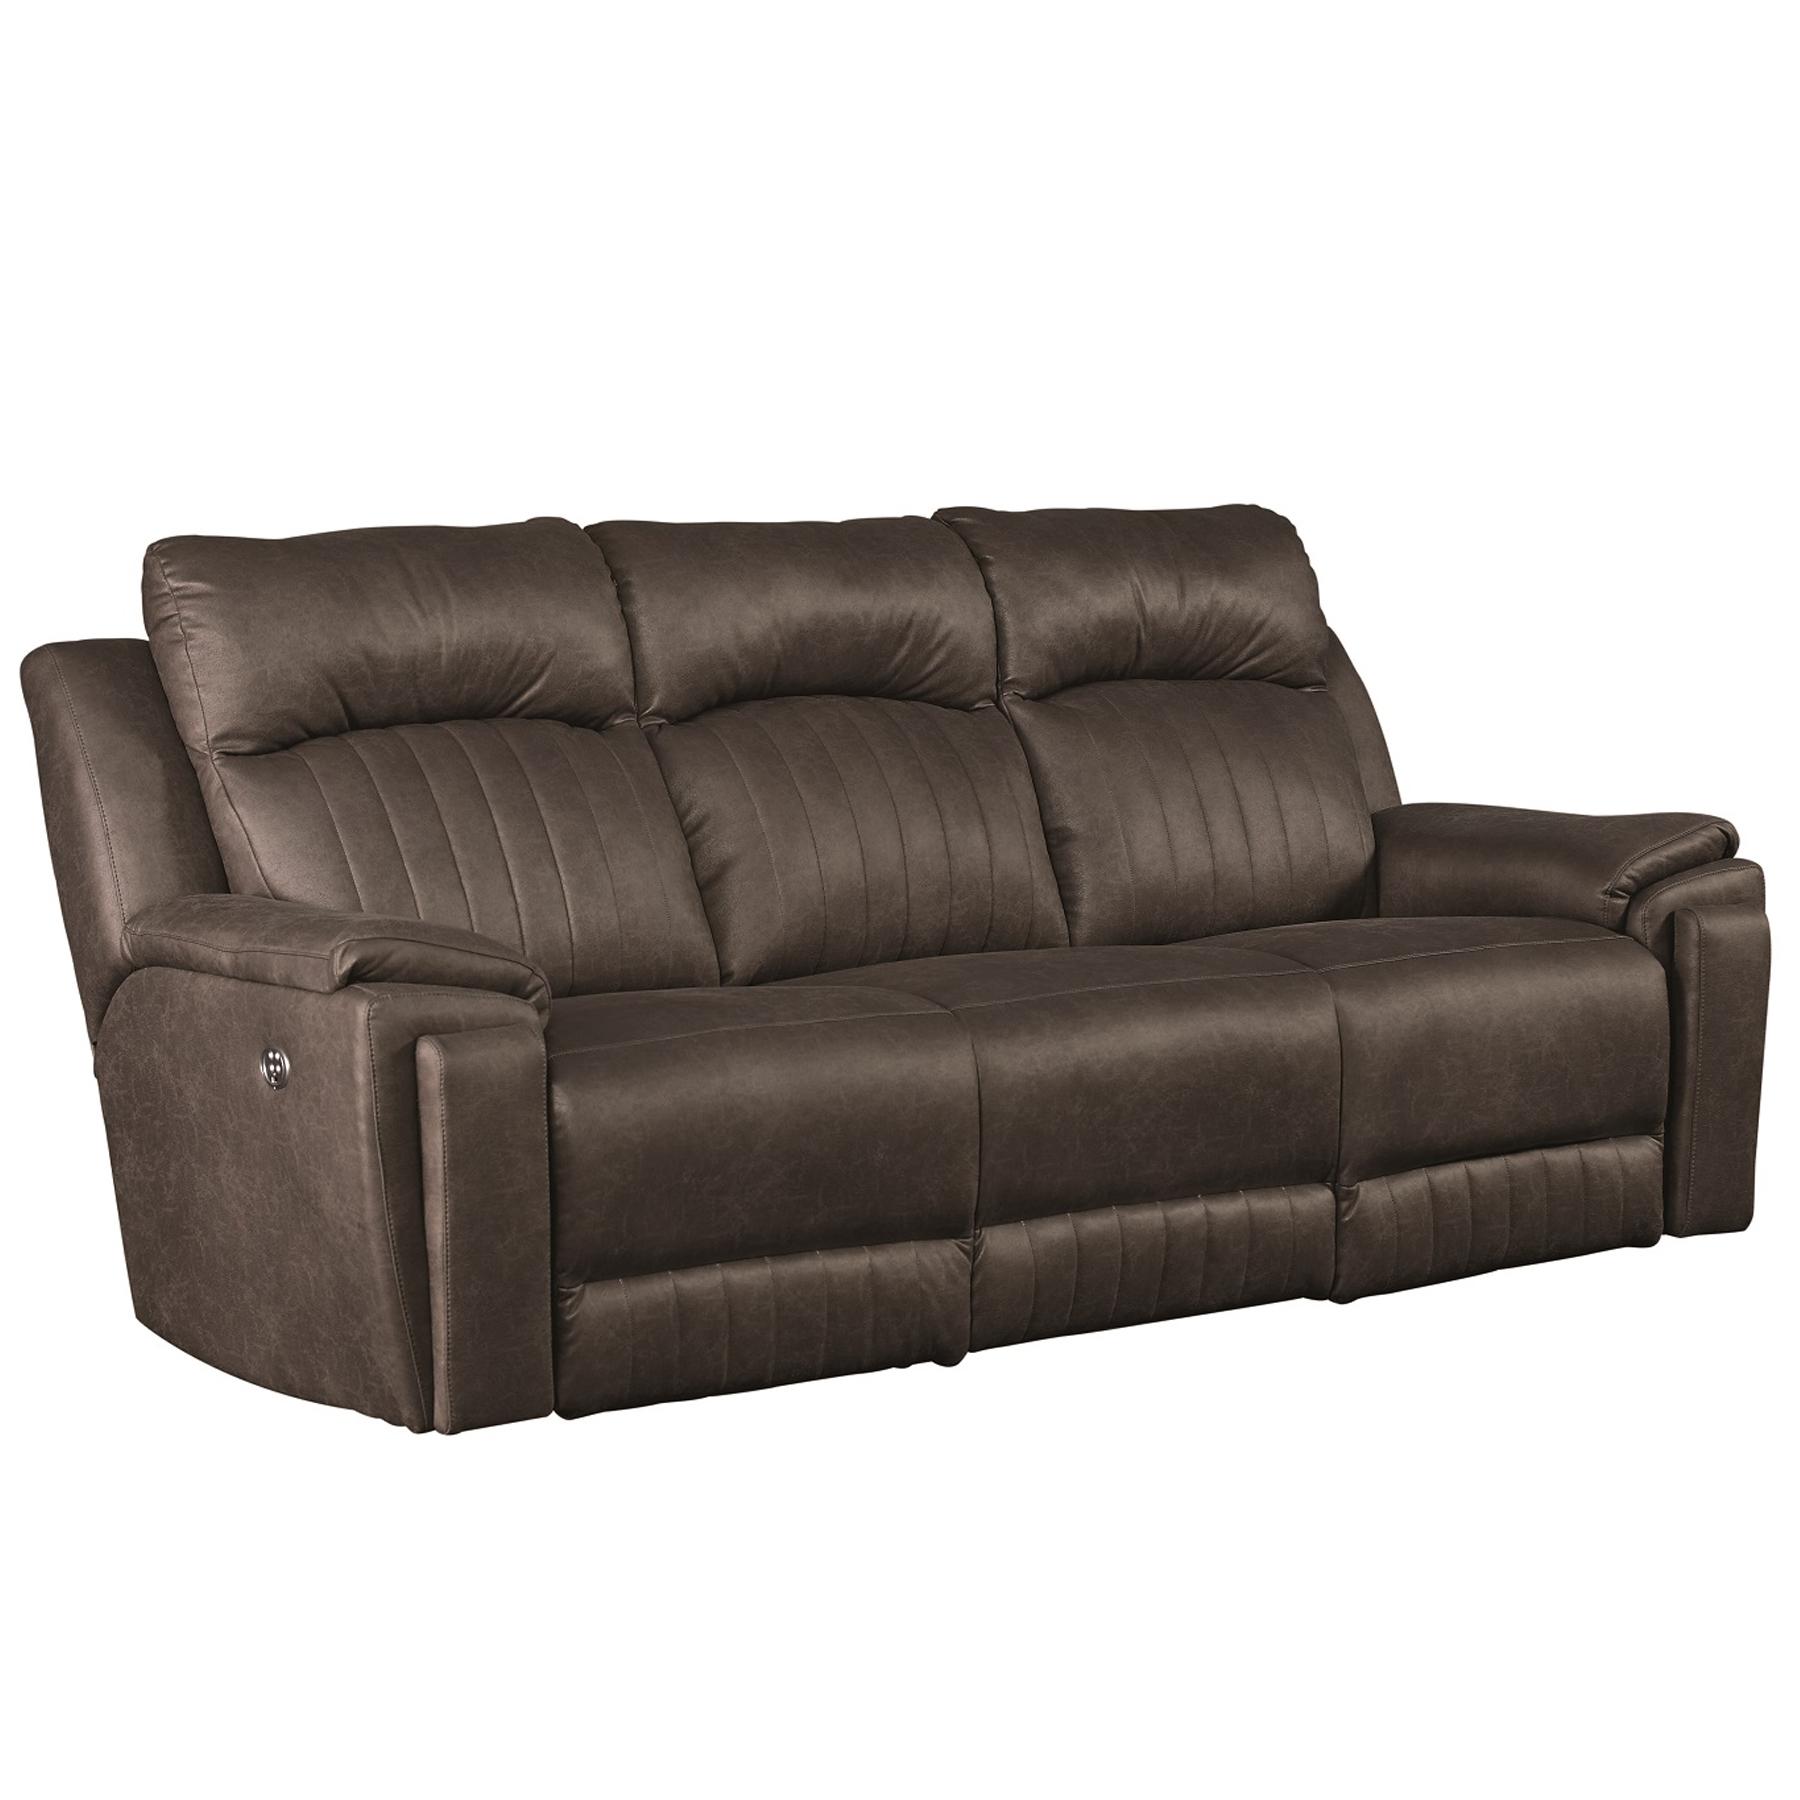 Silver Screen Reclining Sofa W Hidden Arm Sofas And